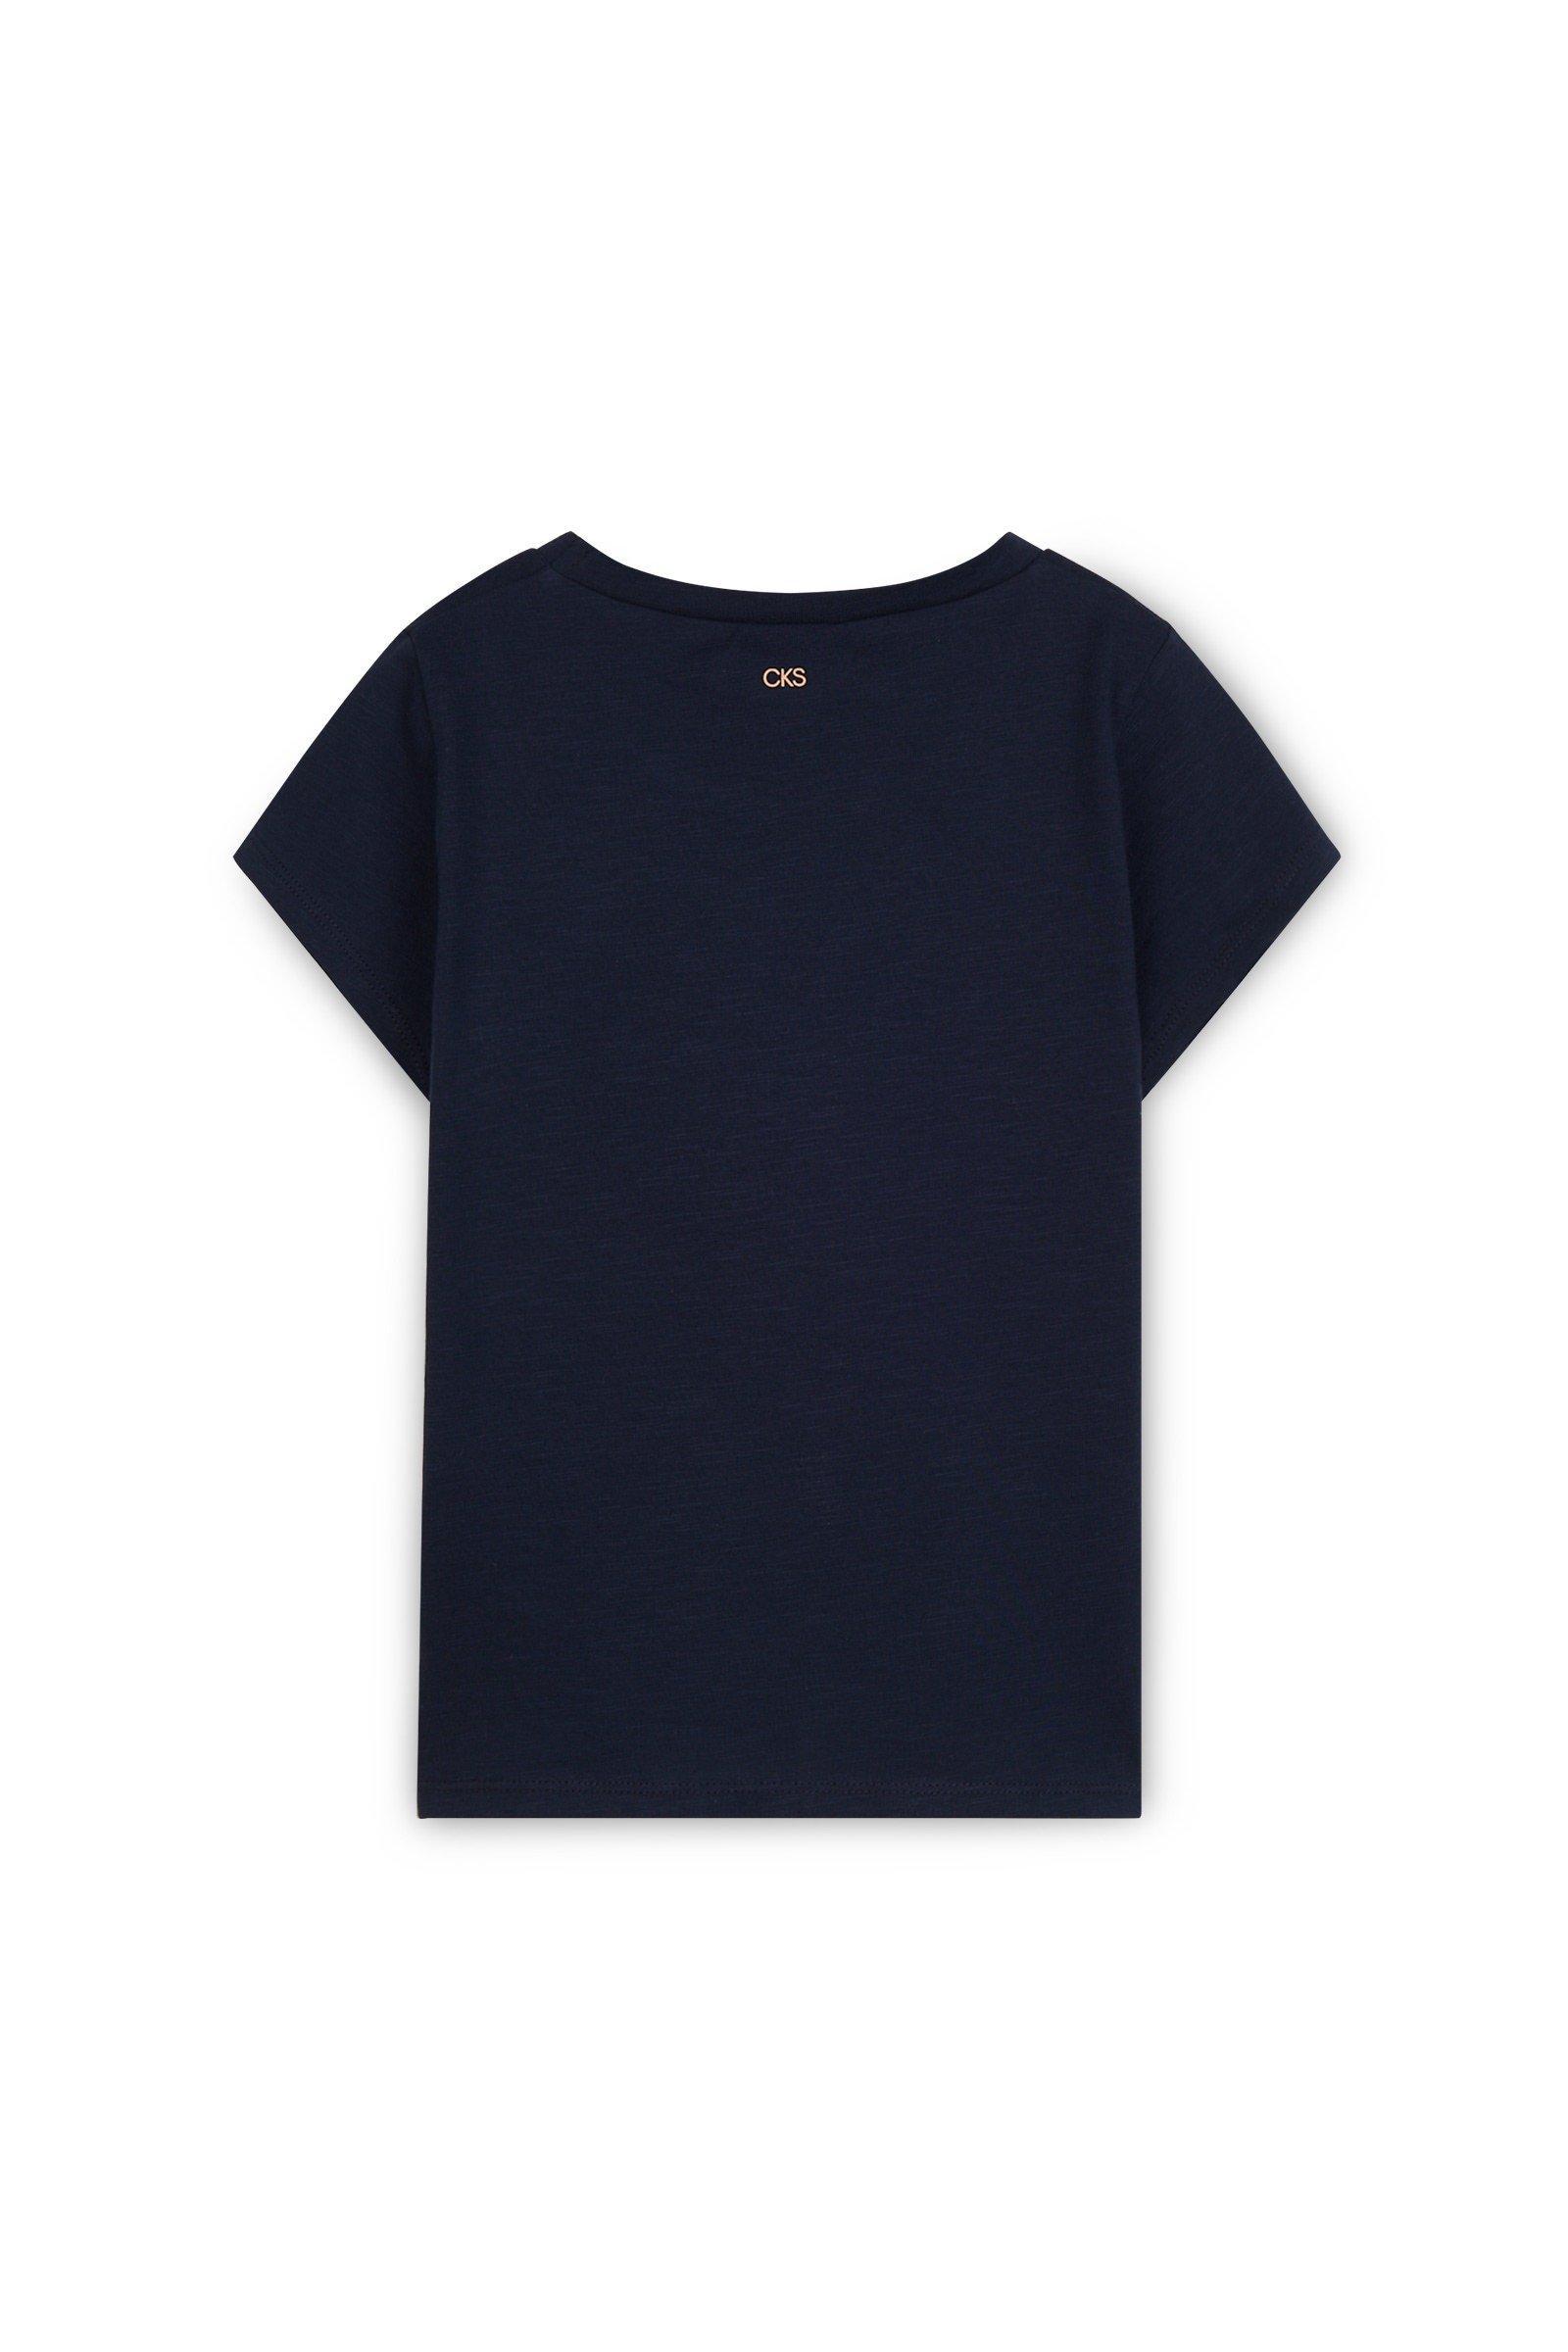 https://webmedia.cks-fashion.com/i/cks/123143BLD_100_h